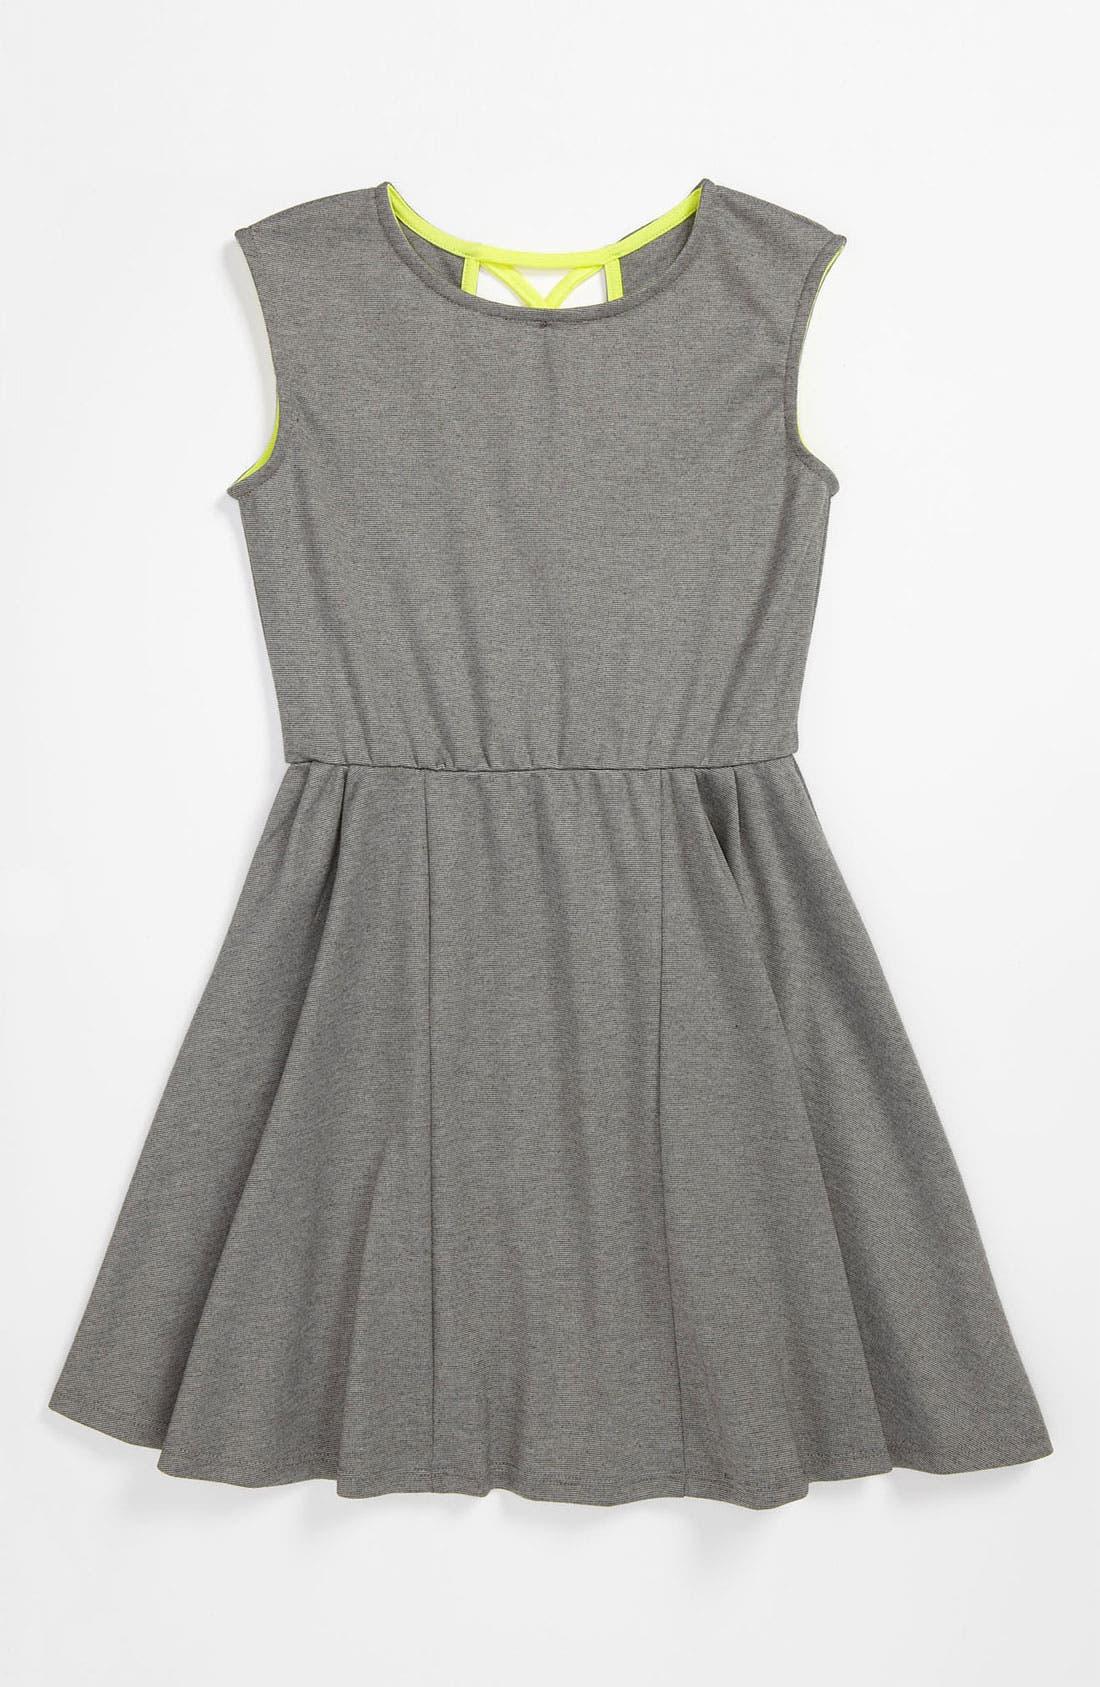 Main Image - W Girl Neon Trim Dress (Big Girls)